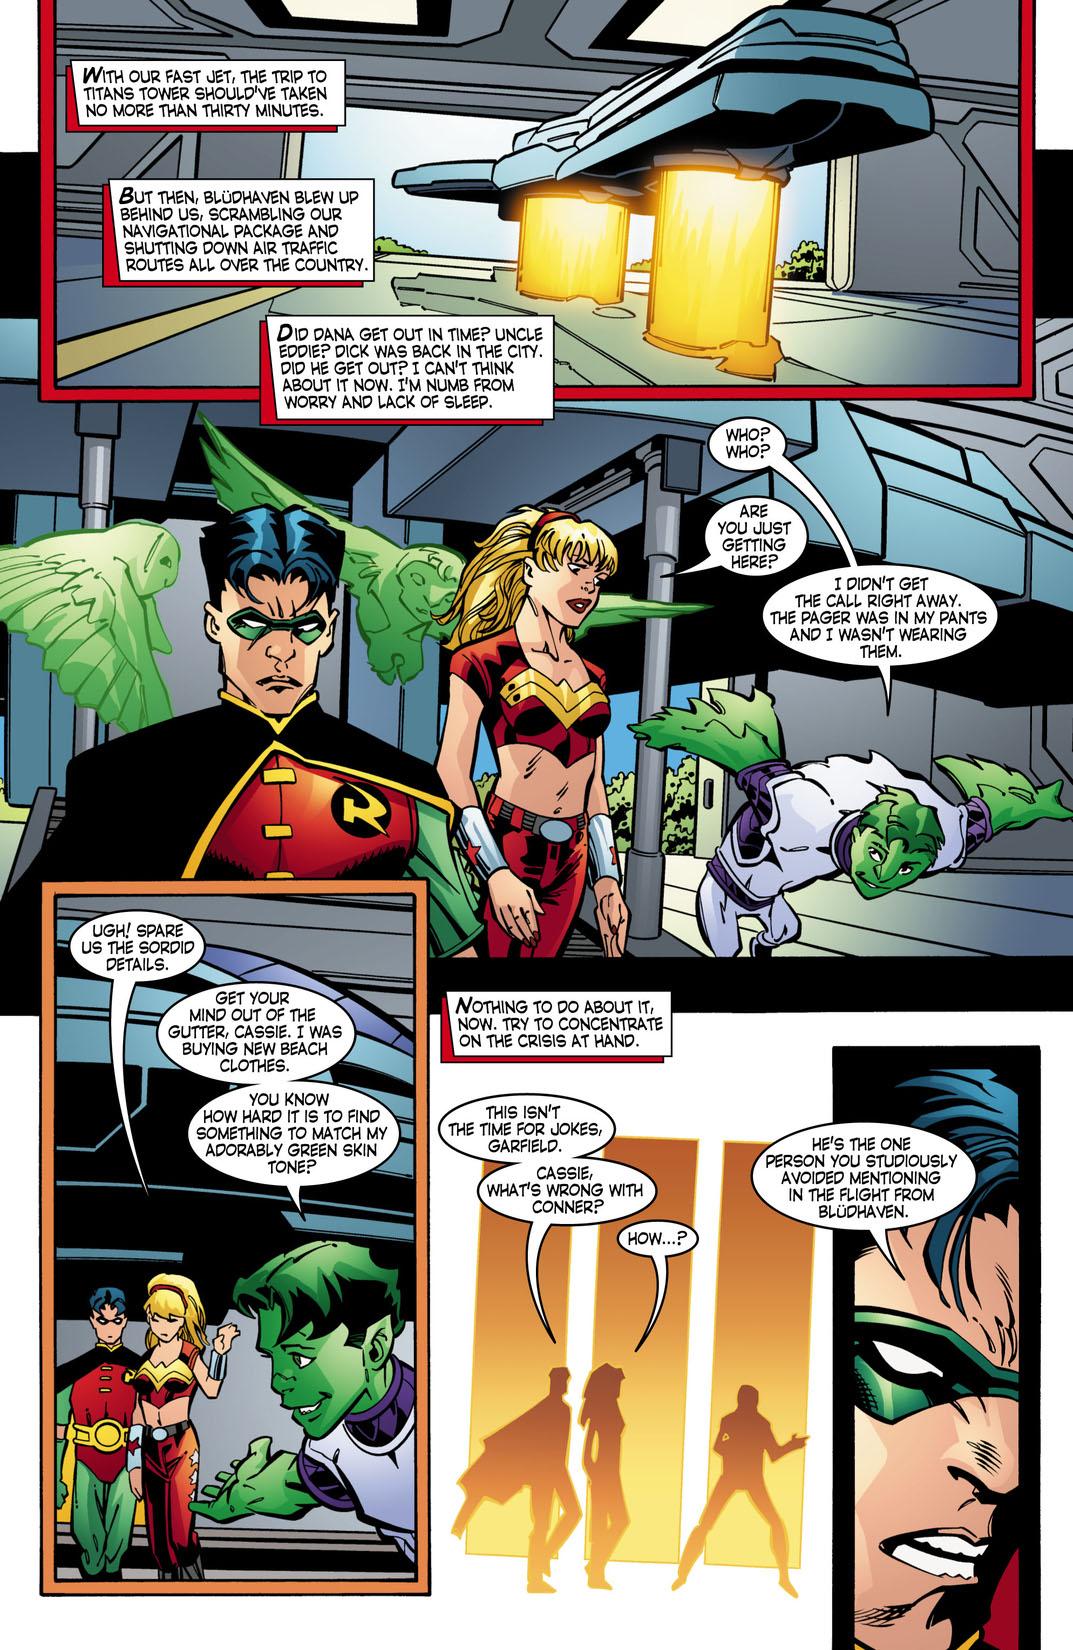 Read Robin (1993-) #146 on DC Universe